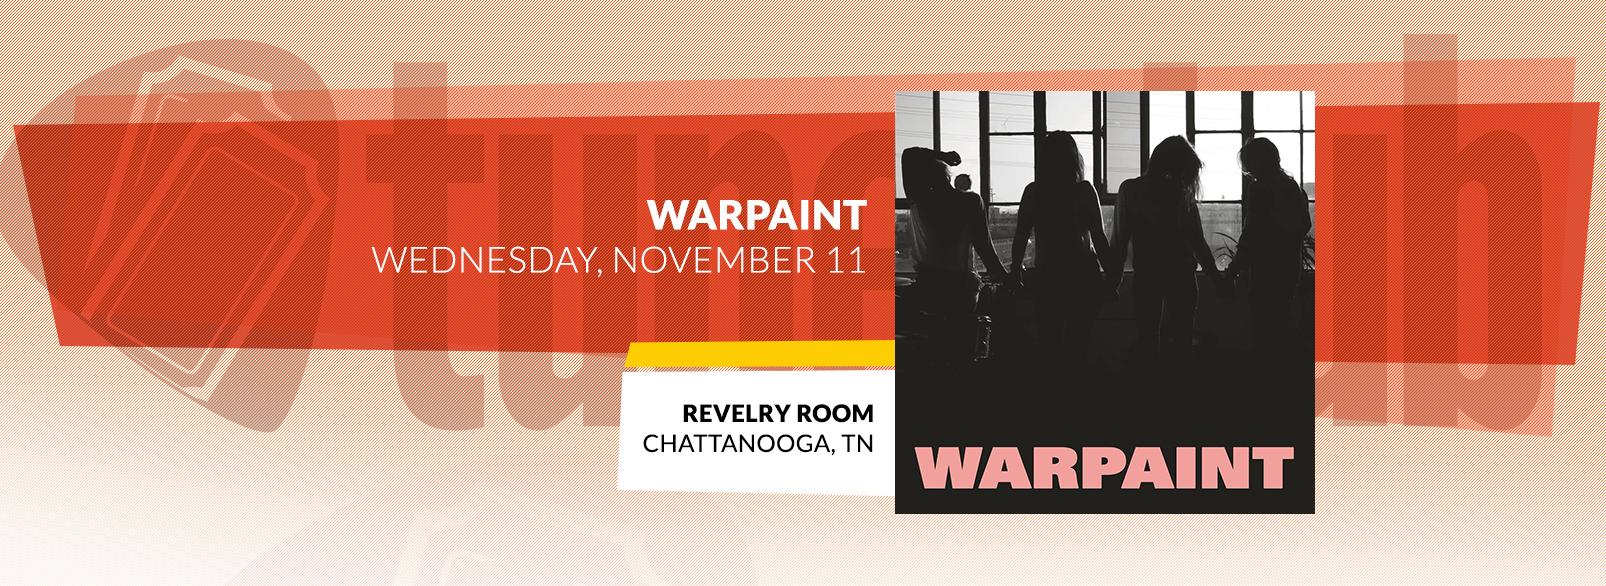 Warpaint @ Revelry Room